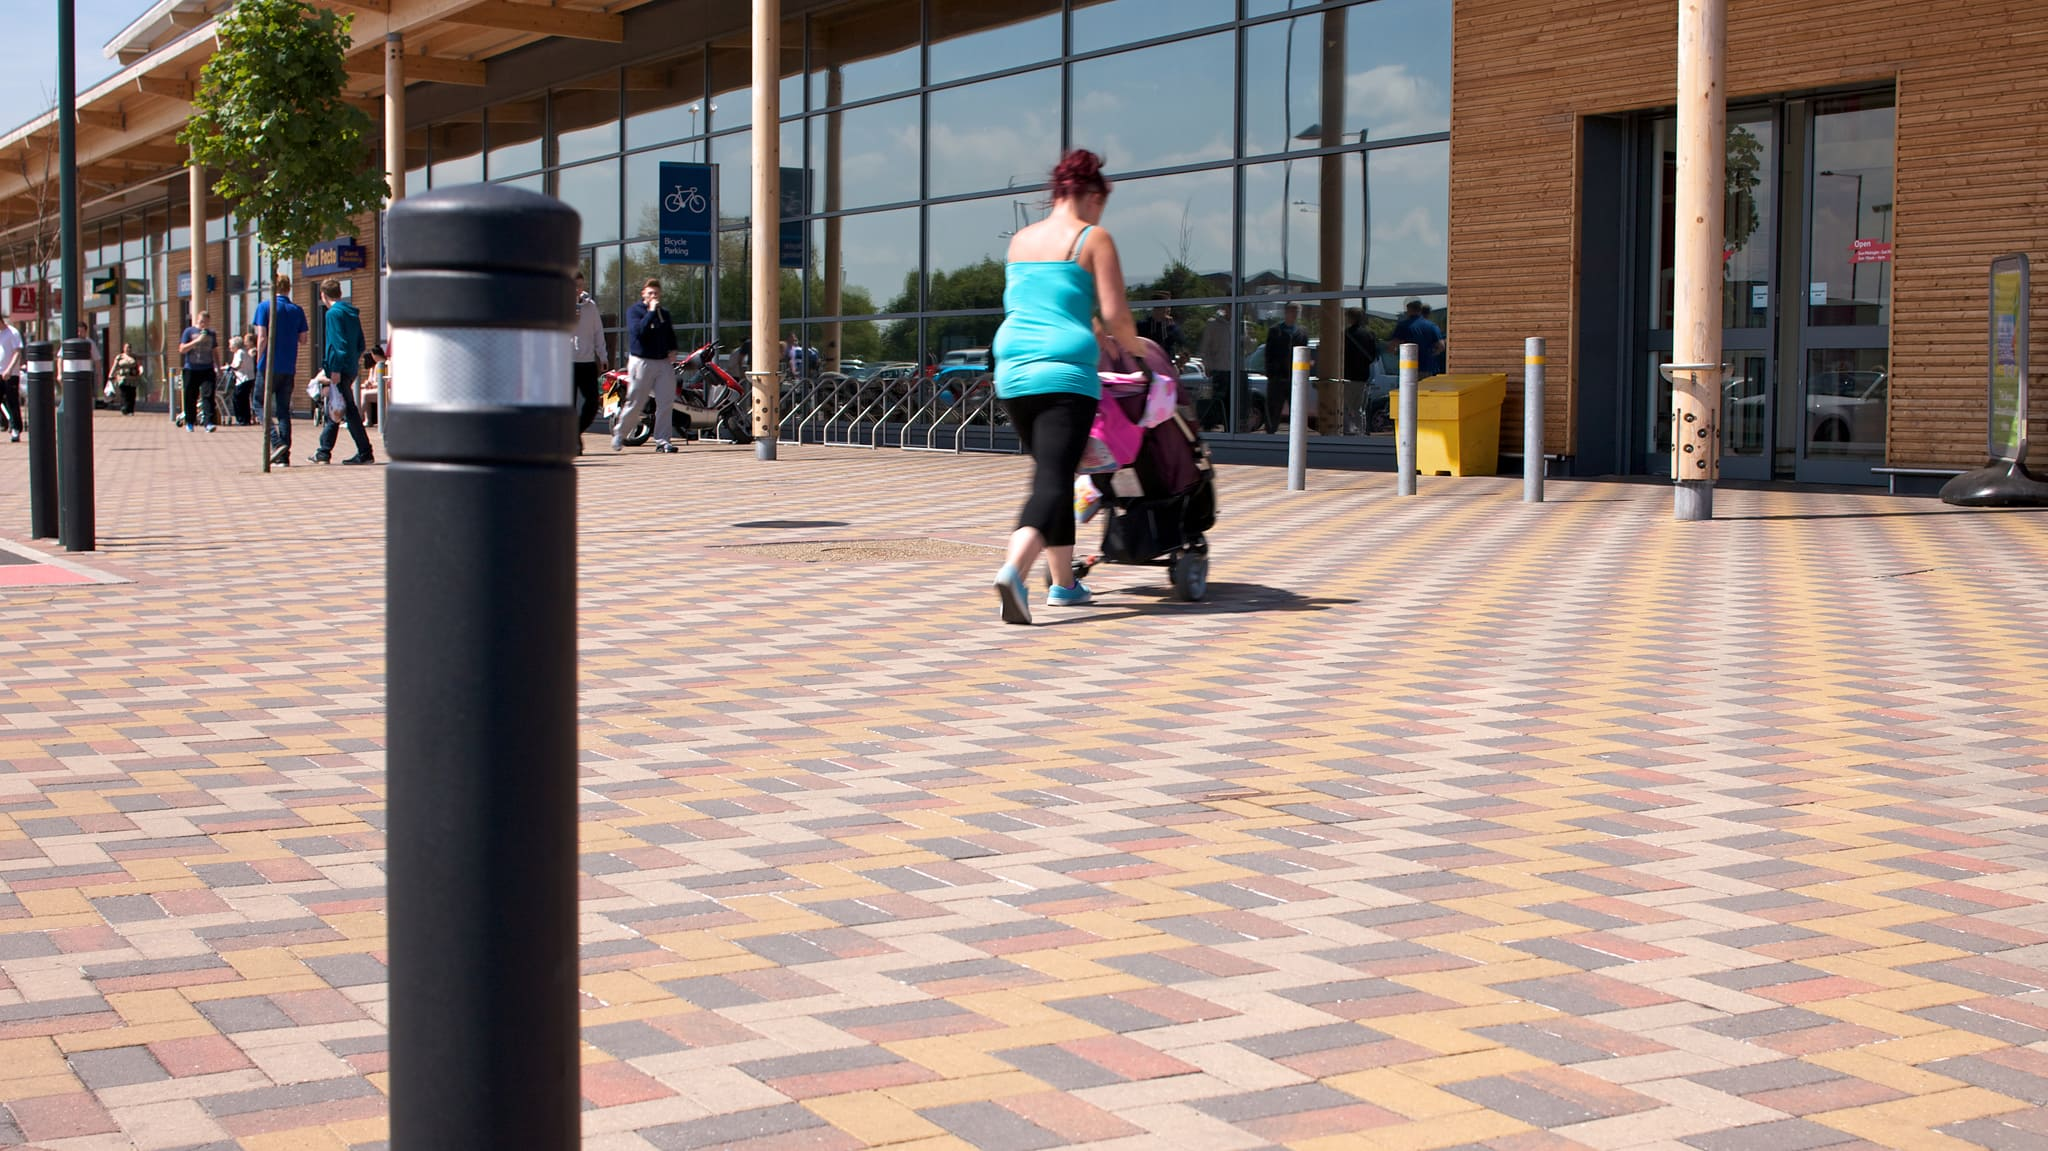 Block paving outside supermarket